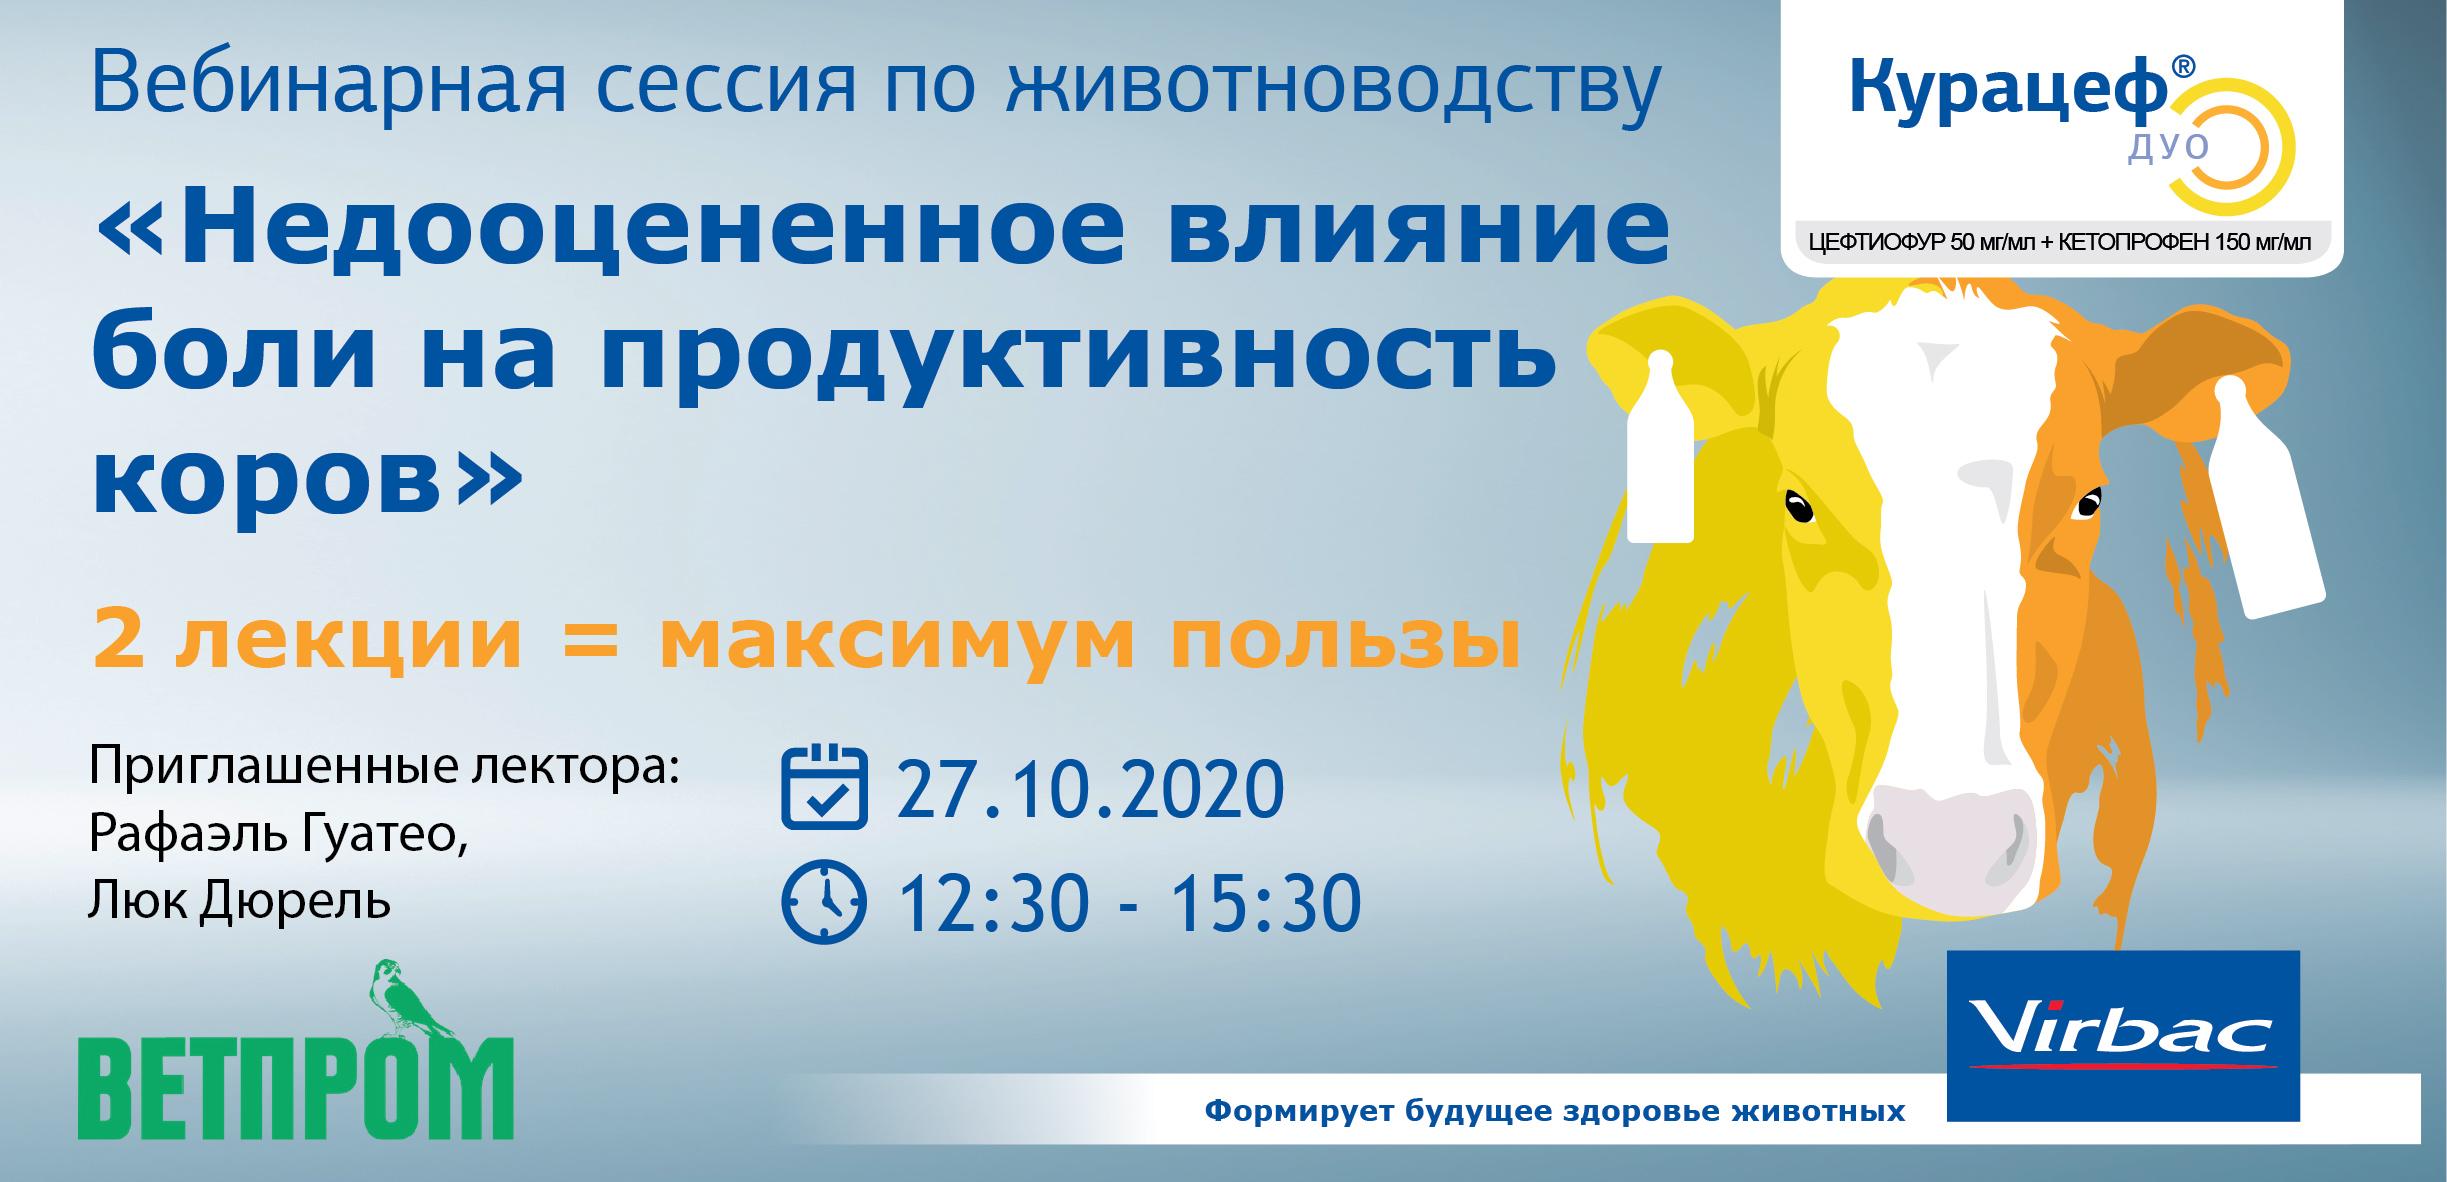 banner_kuratsef_duo_Montazhnaya_oblast_1